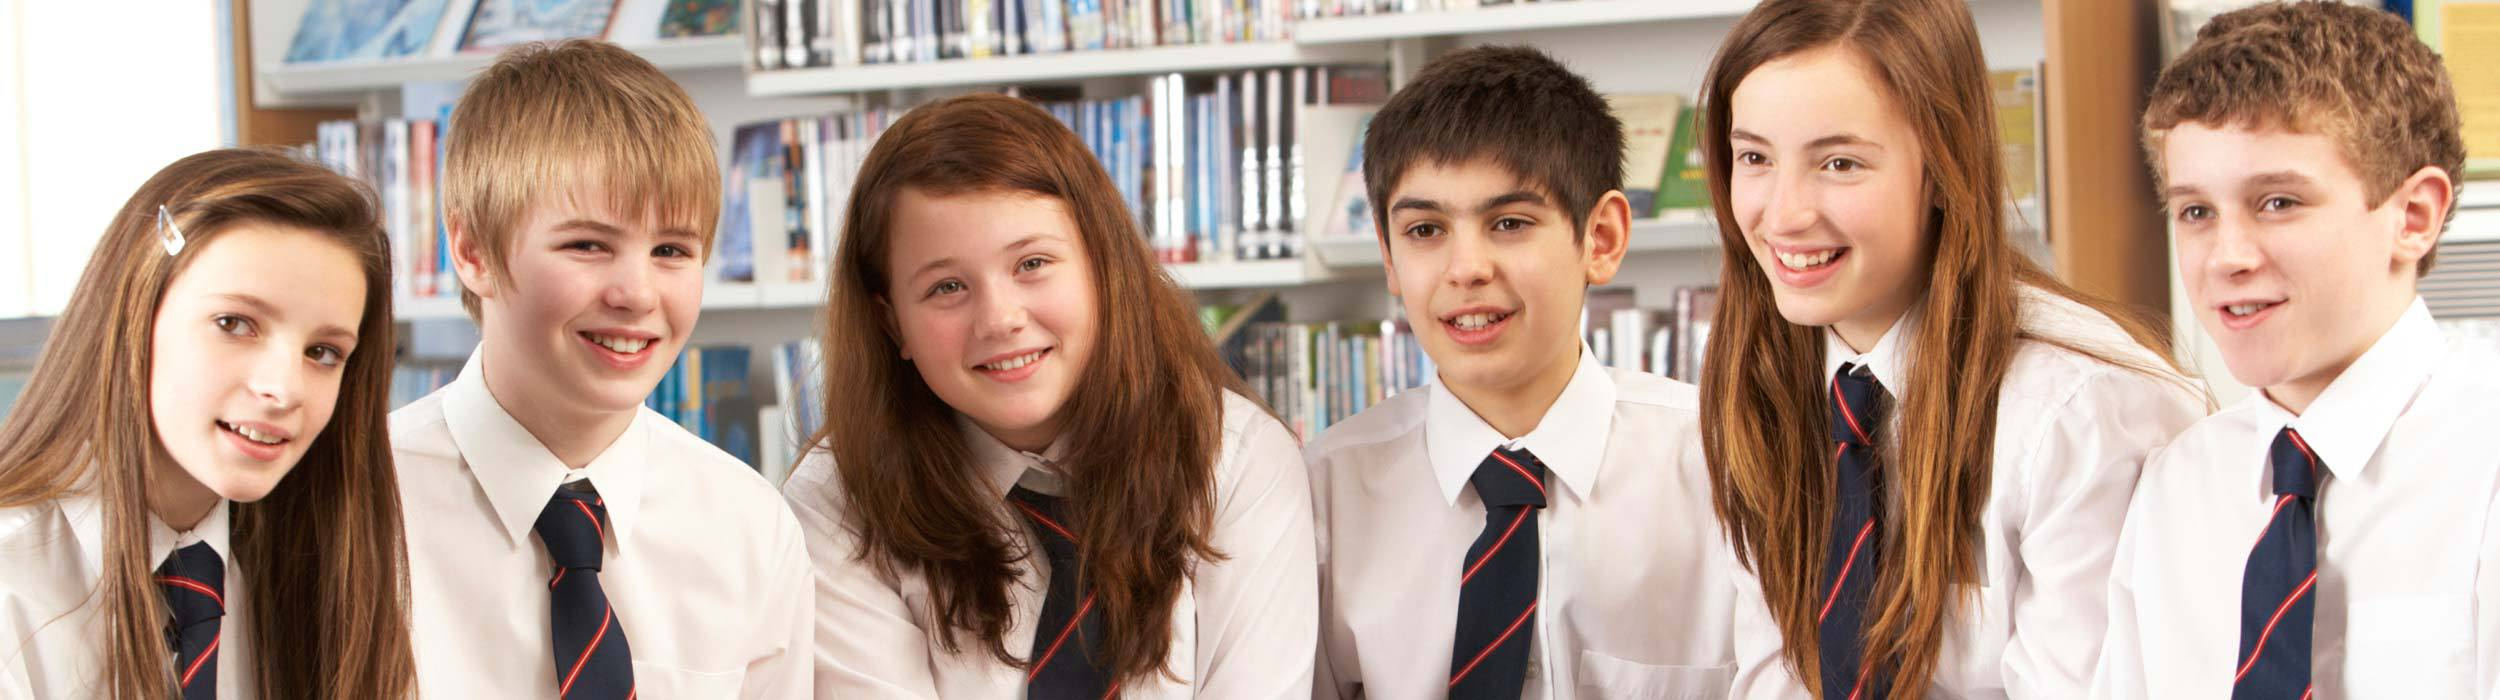 Children wearing a school uniform